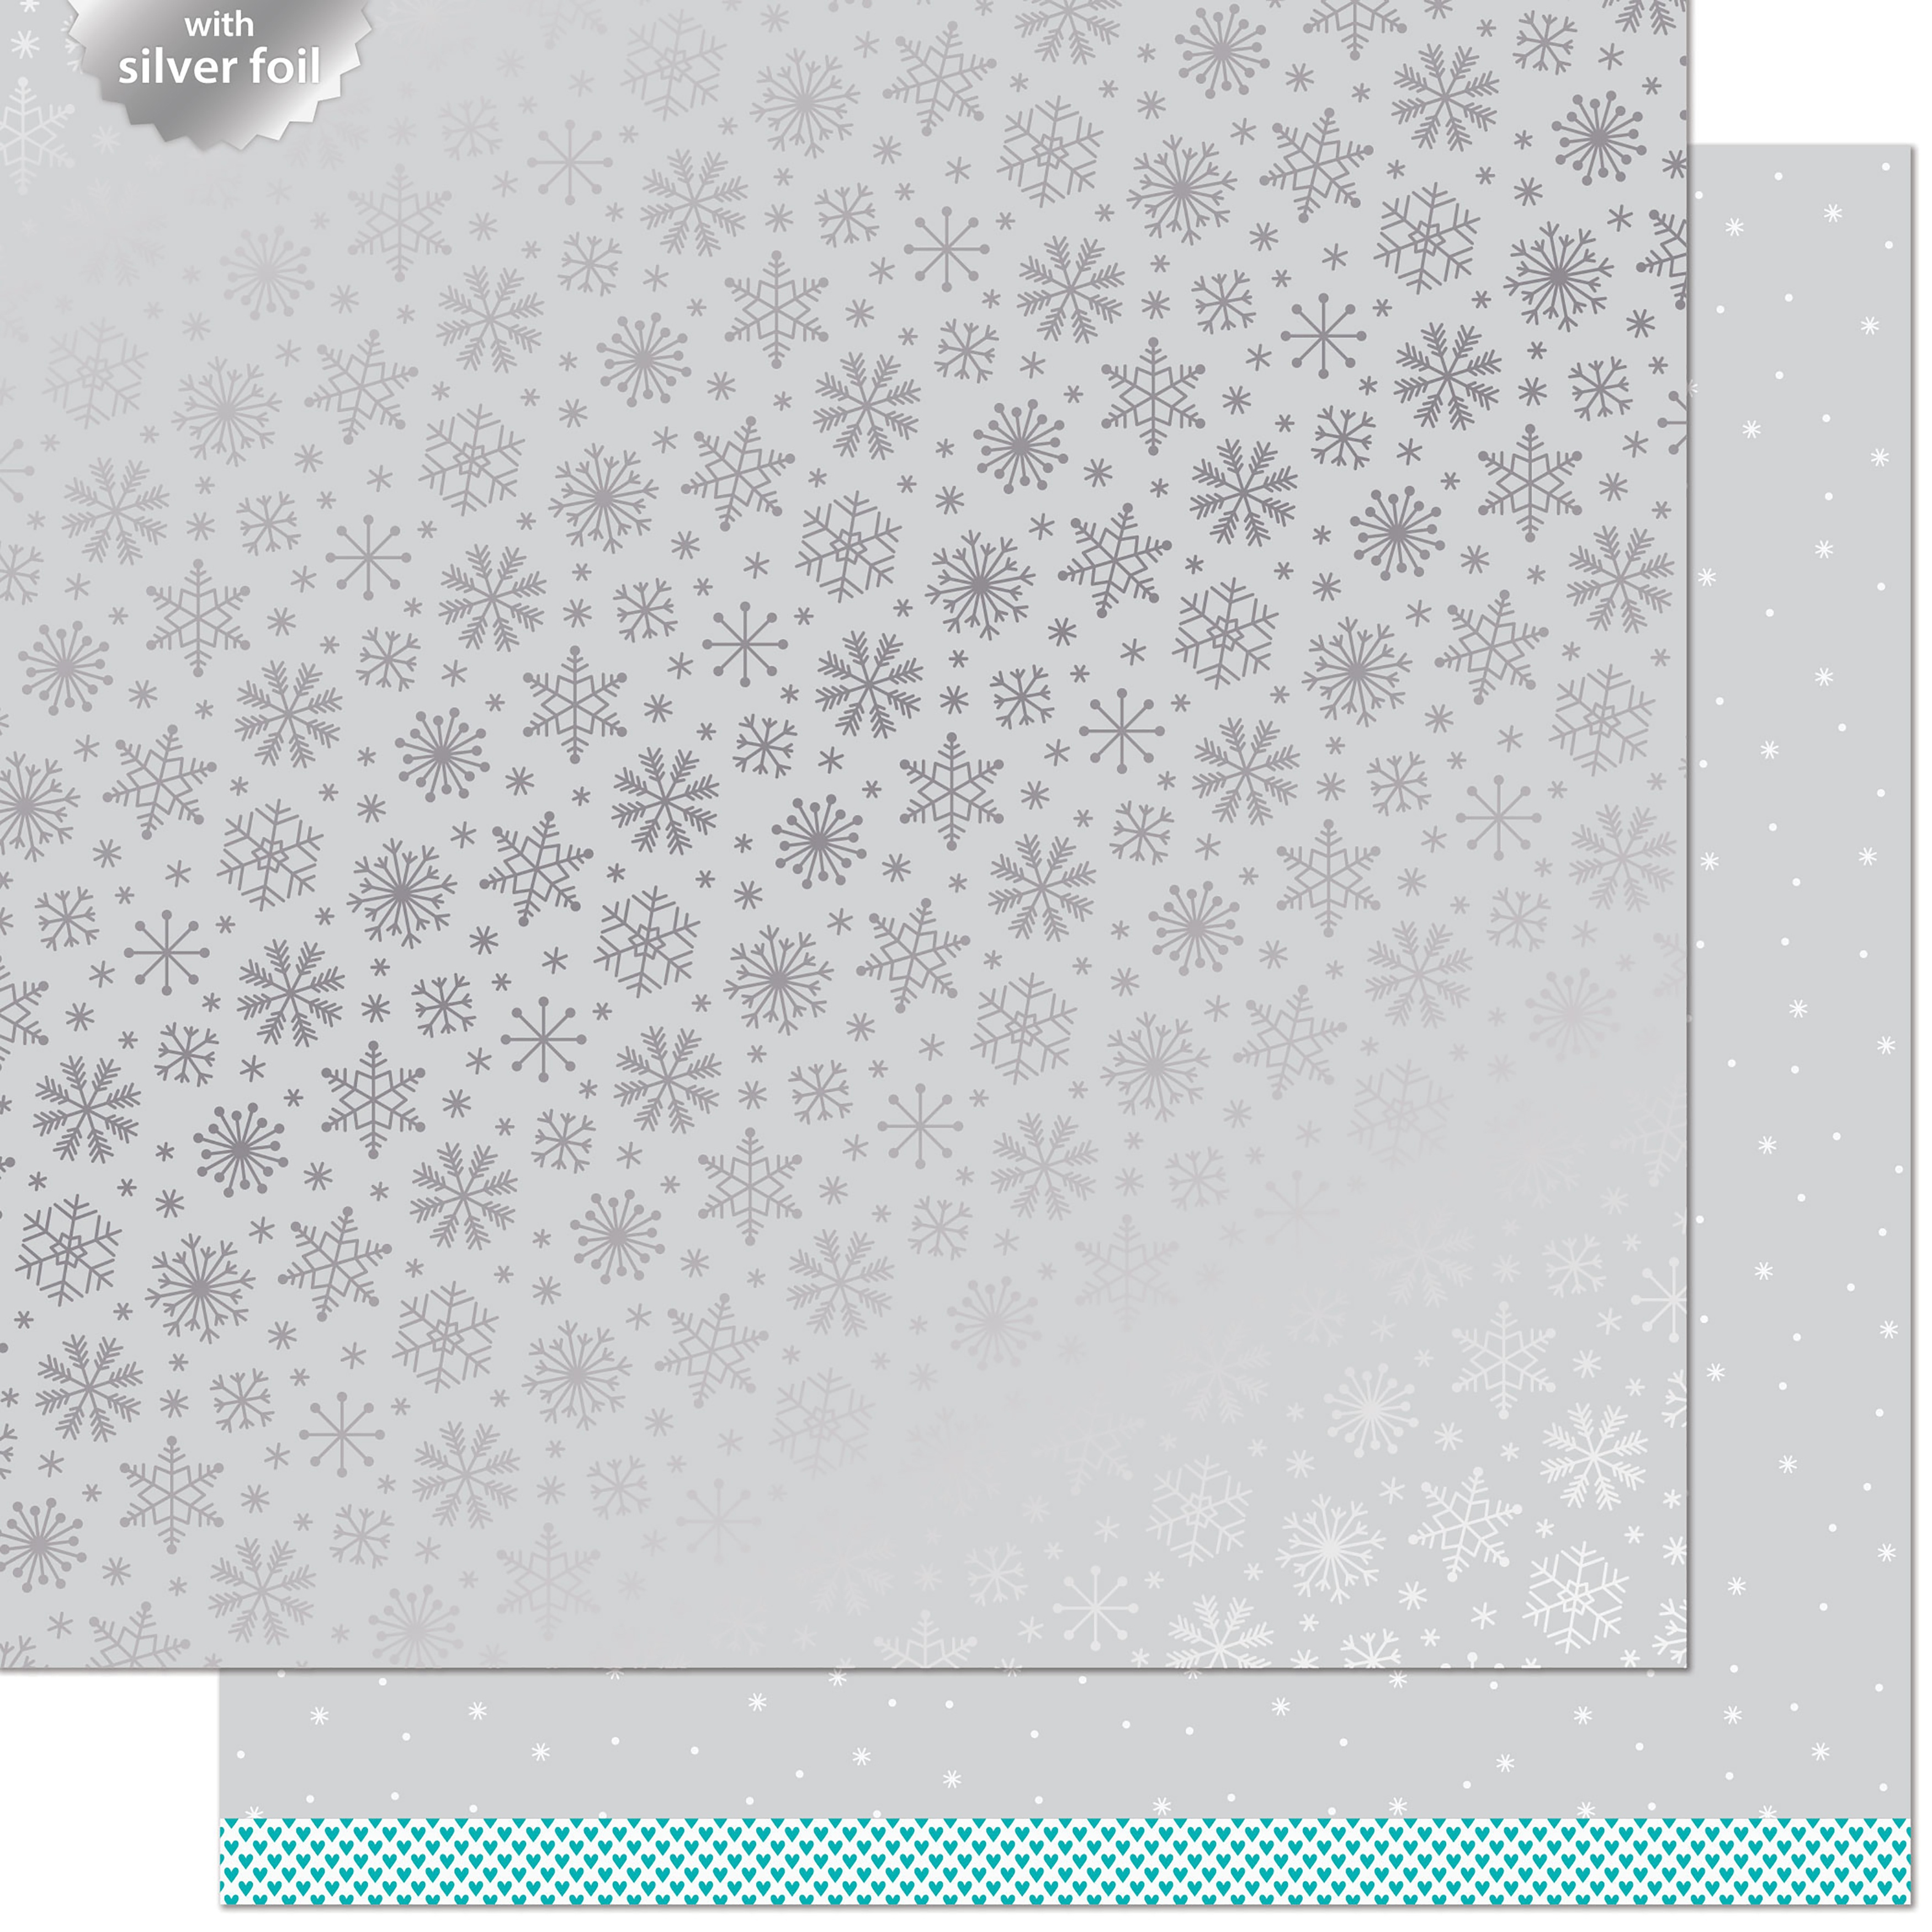 Let It Shine Snowflakes Foiled Cardstock - Brrr